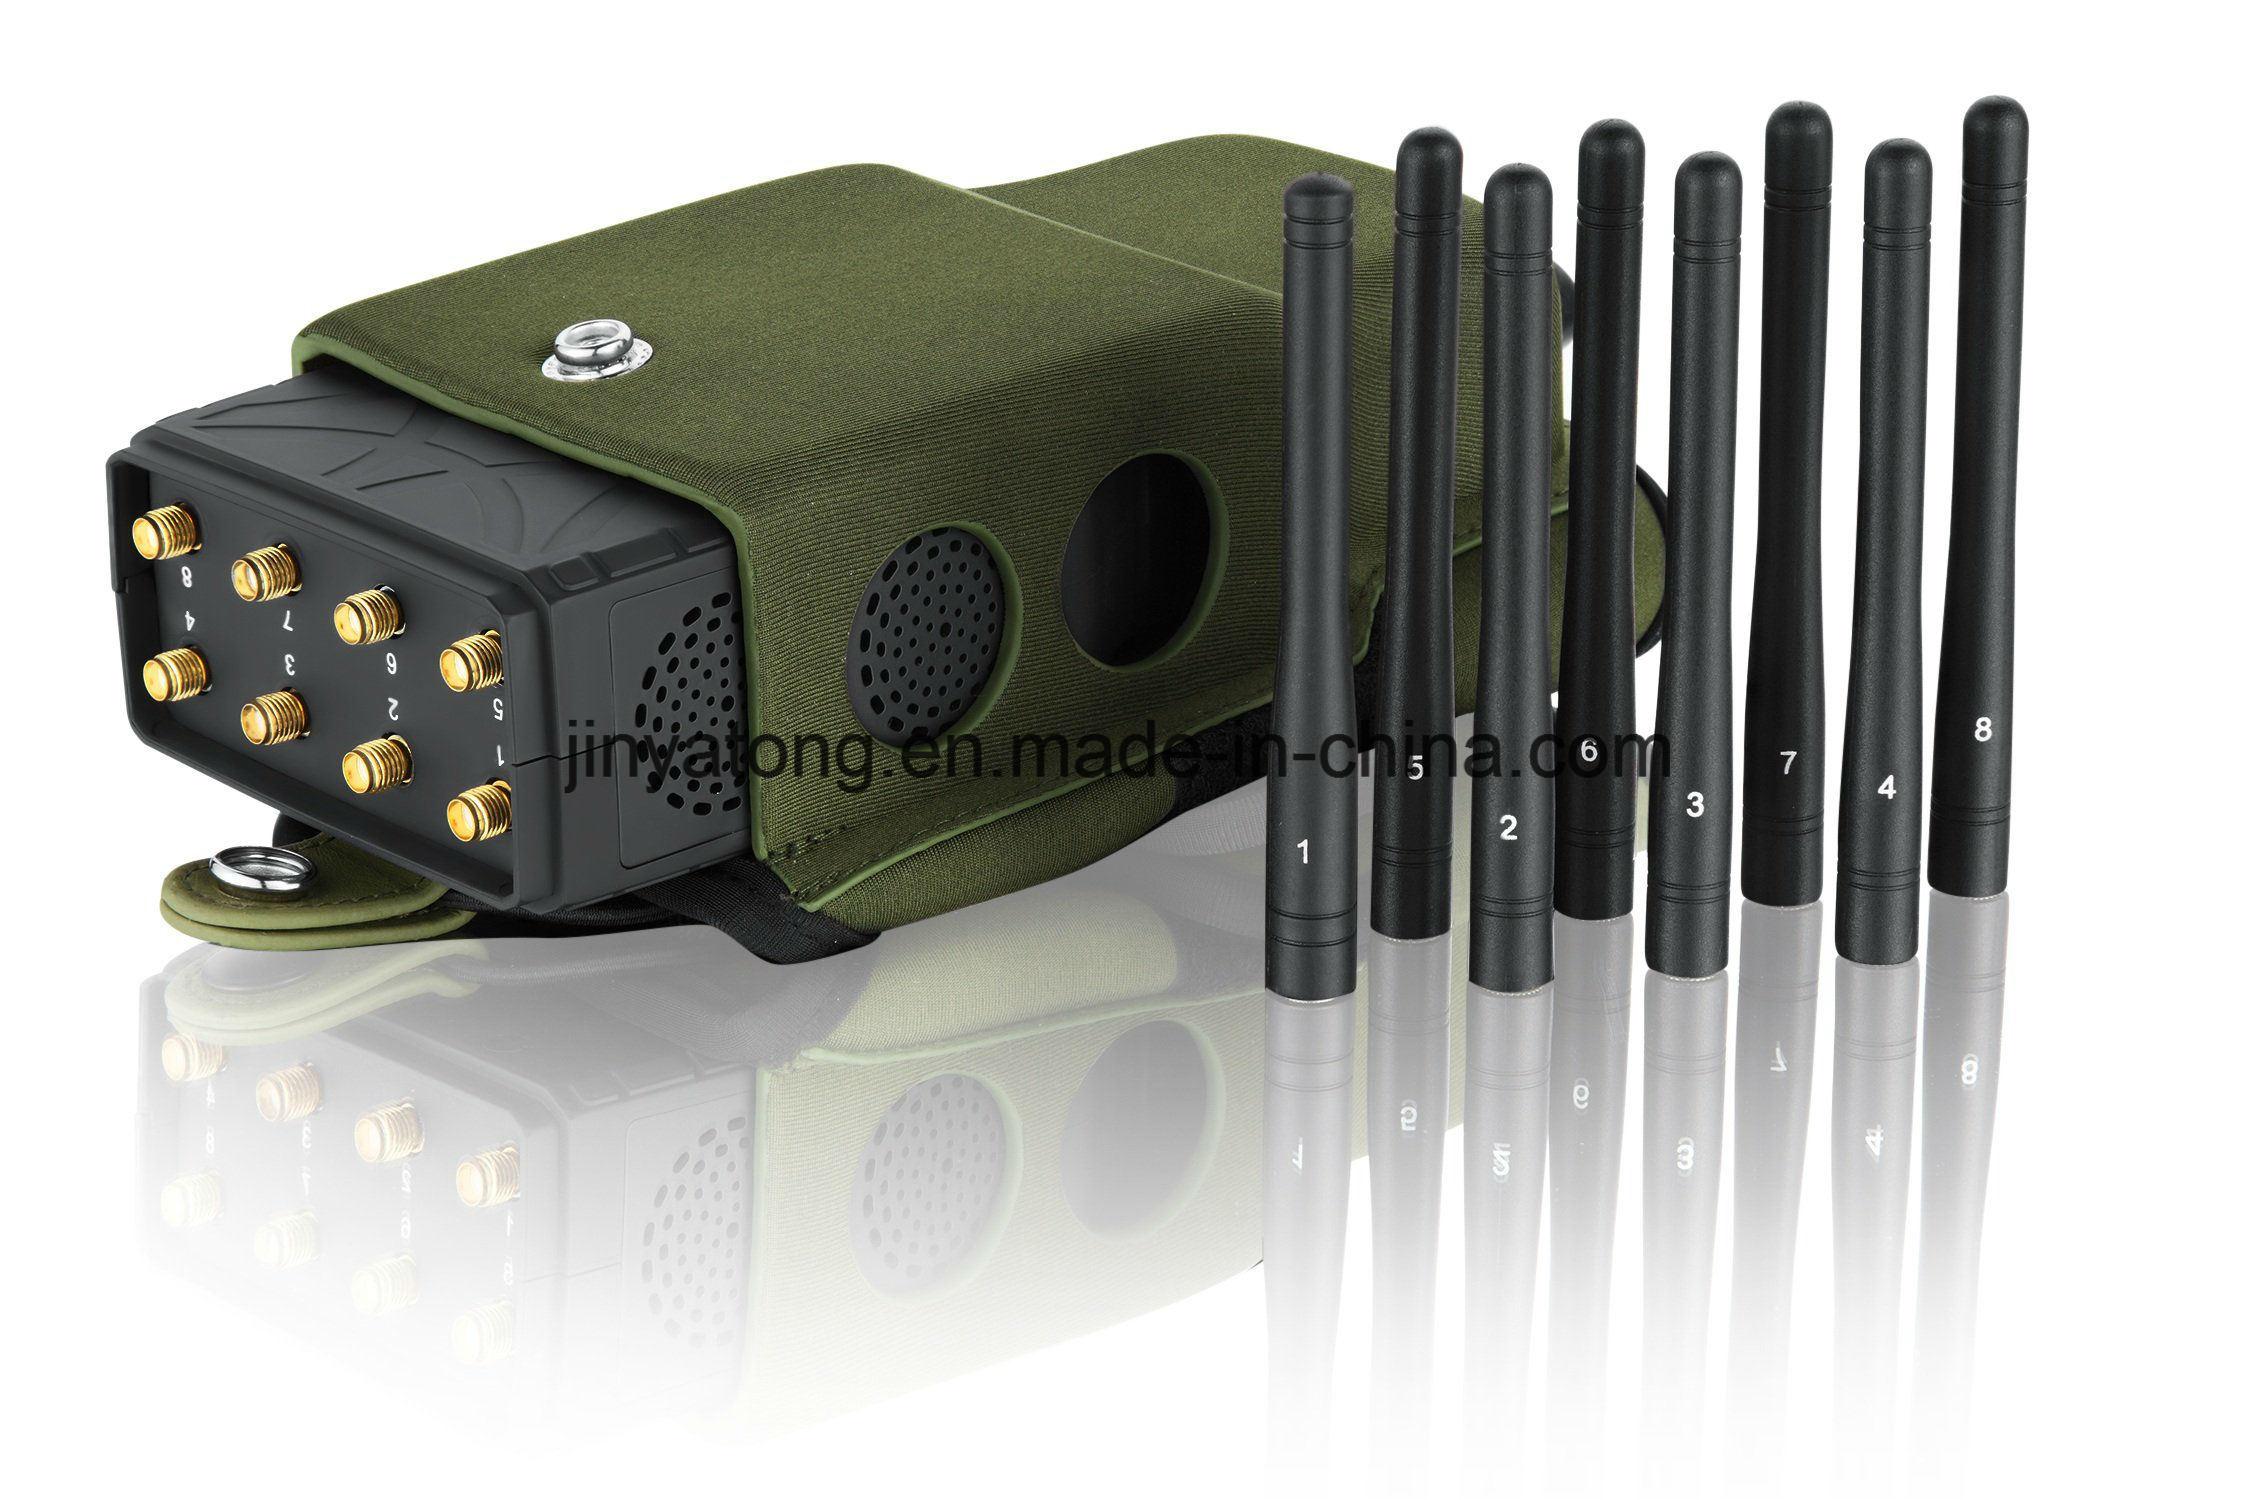 China Lojack Signal Breaker Mobile Phone Jammer GPS Blocker with 8